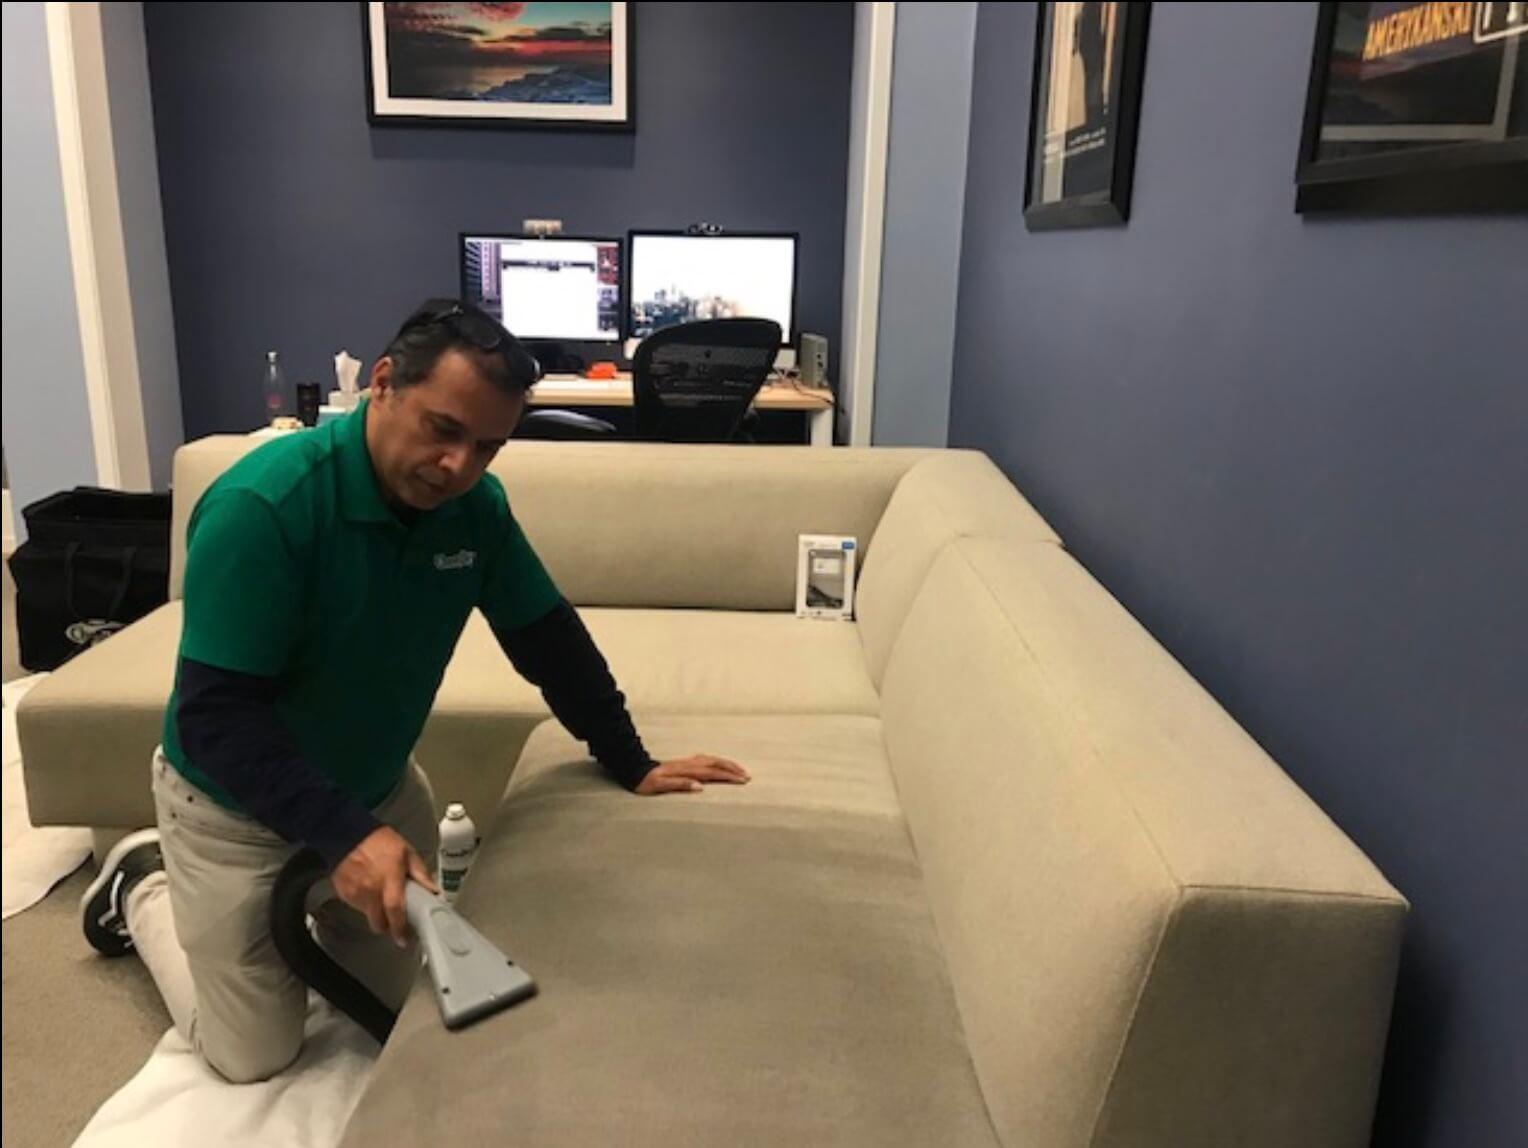 Upholstery Cleaning San Antonio